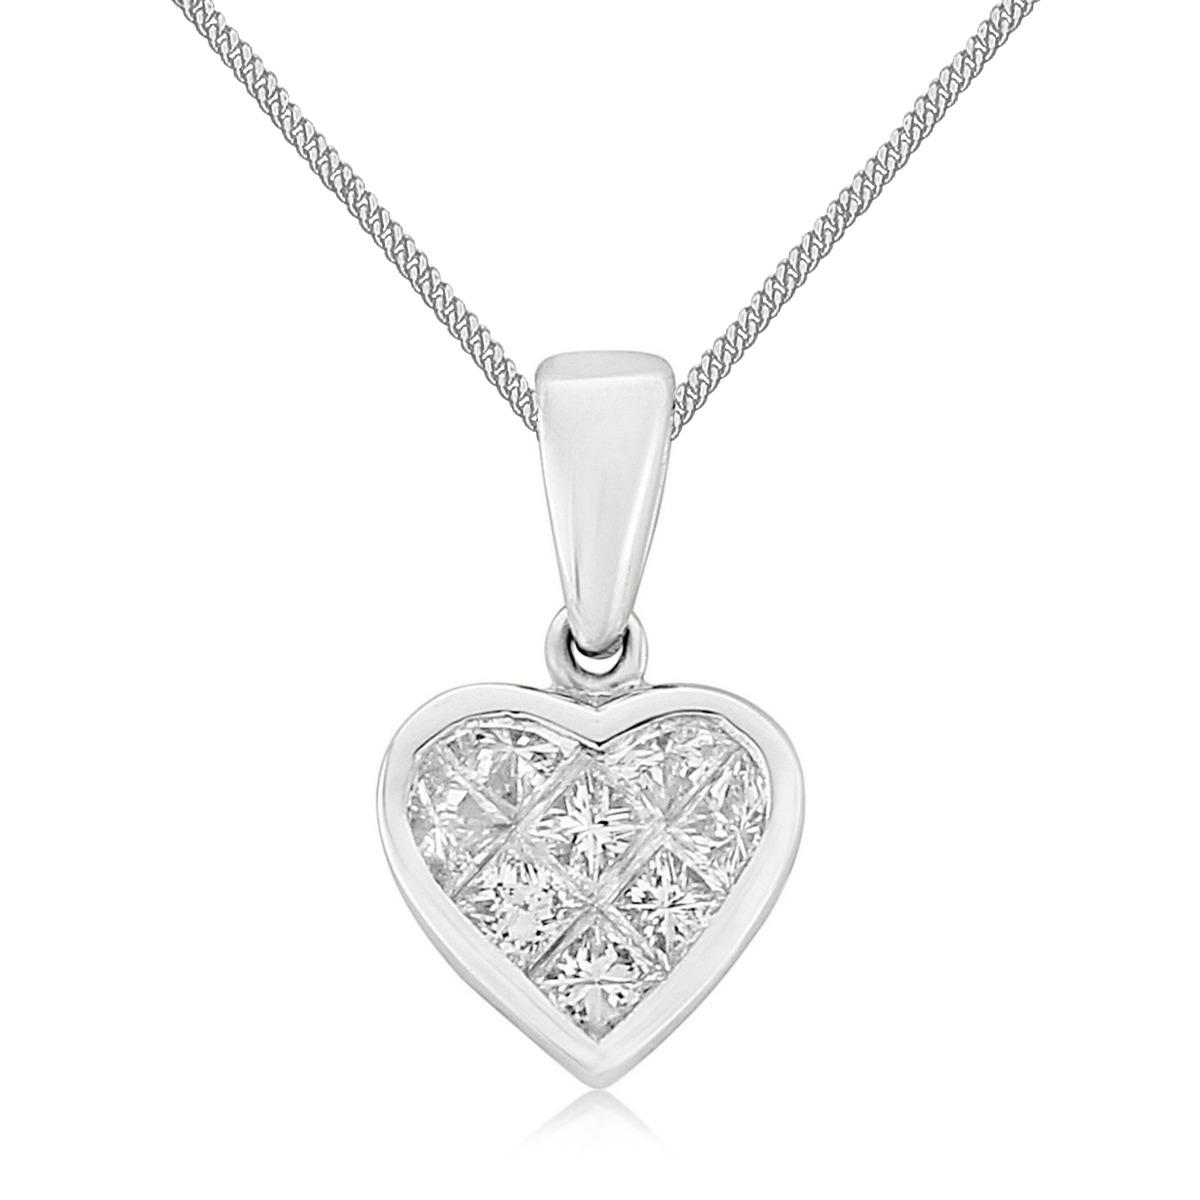 18ct White Gold Princess Cut Diamond Heart Pendant